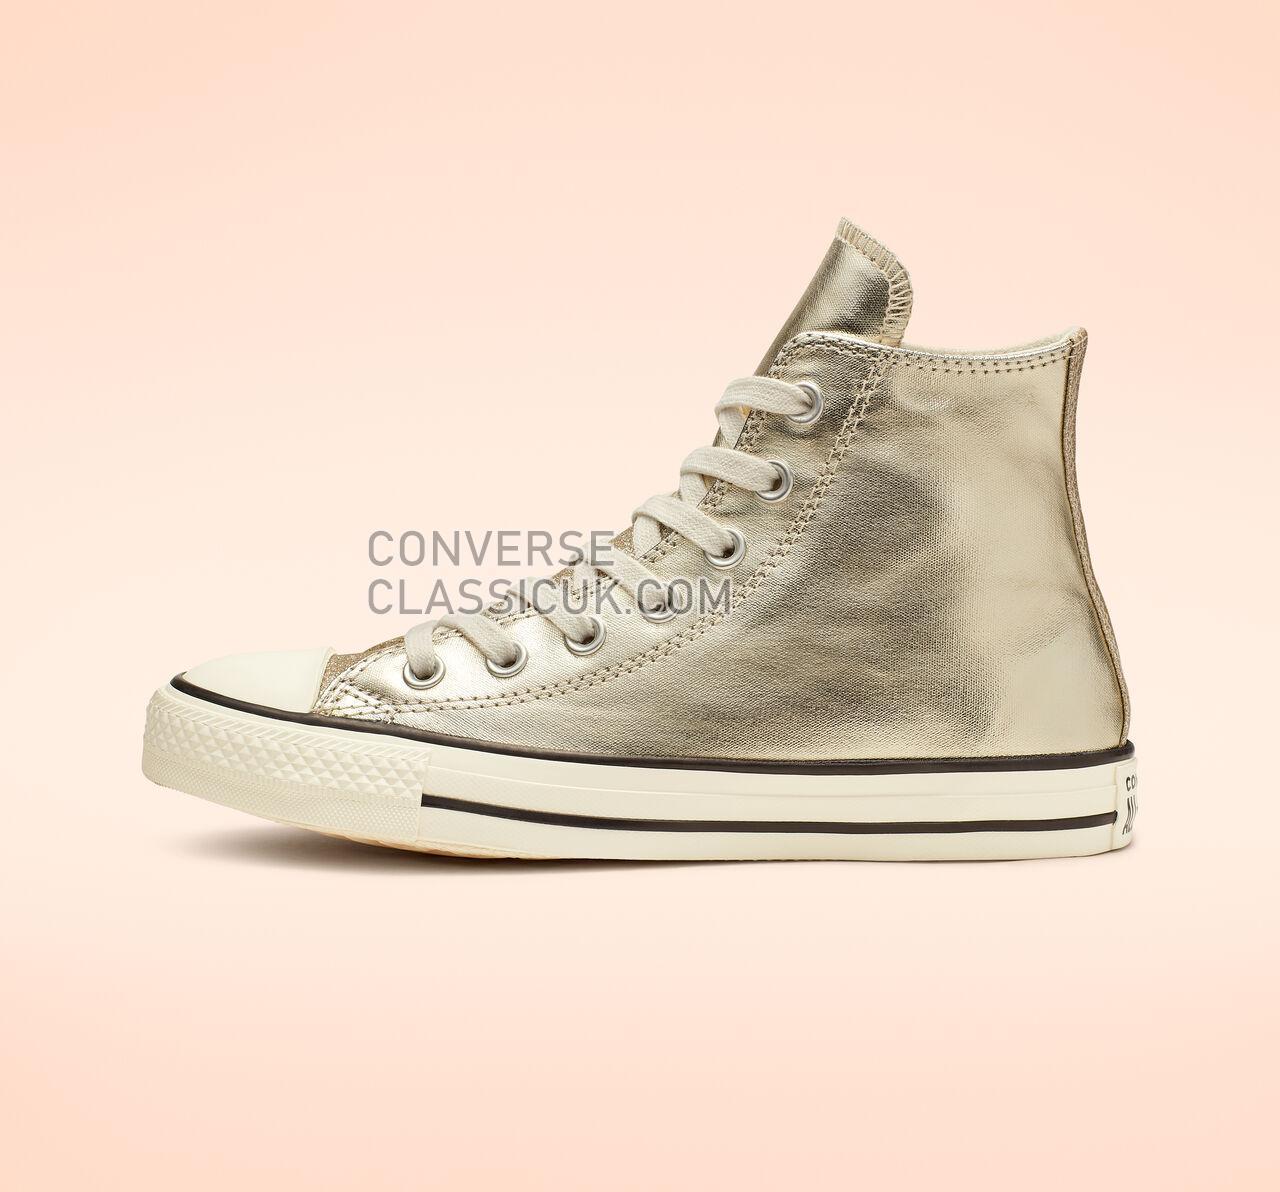 Converse Chuck Taylor All Star Shiny Metal High Top Womens 564851C Light Gold/Egret/Black Shoes